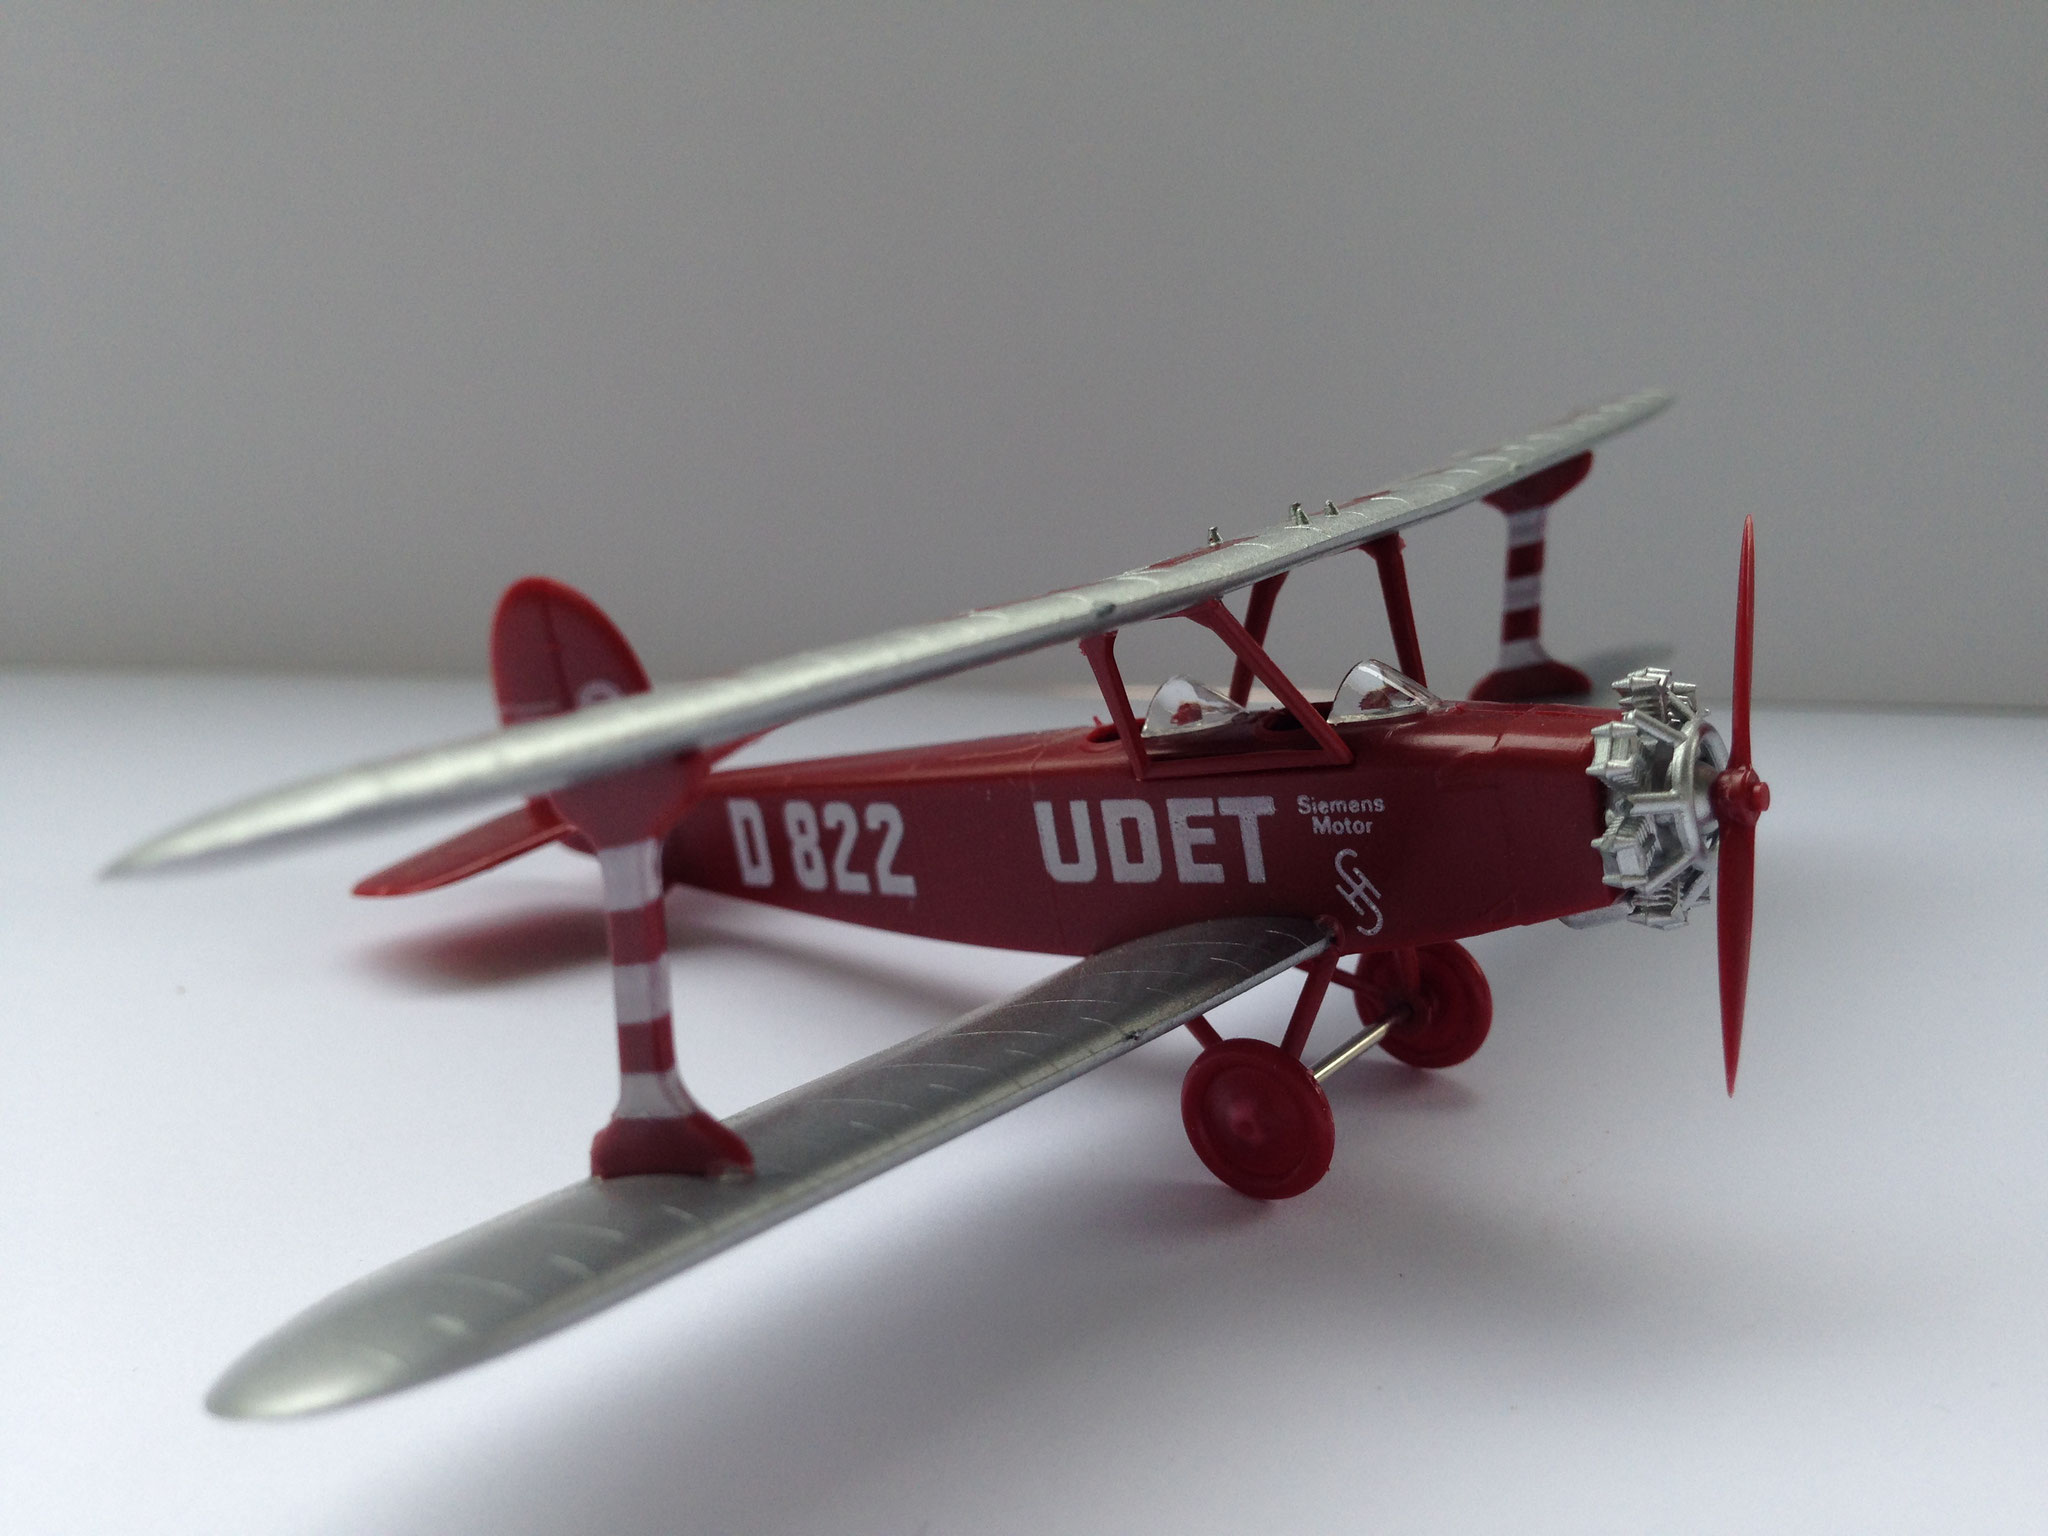 Udet Flamingo, Kunstflug- und Schulflugzeug, rotbraun, Fertigmodell, Art. Nr. 981 (ab 1994 im Programm)